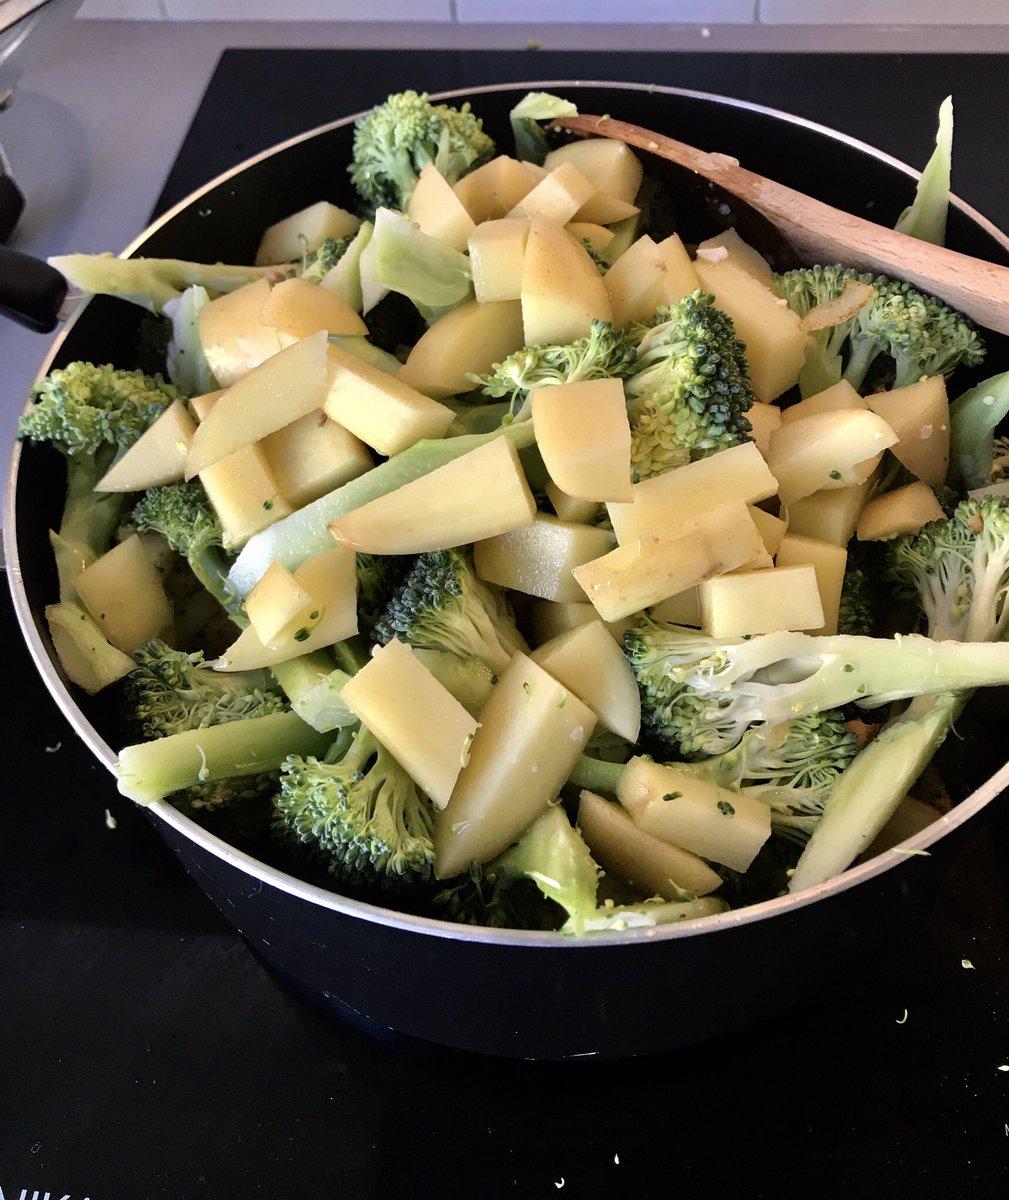 Someone somewhere misjudged how much vegetable-stuff...